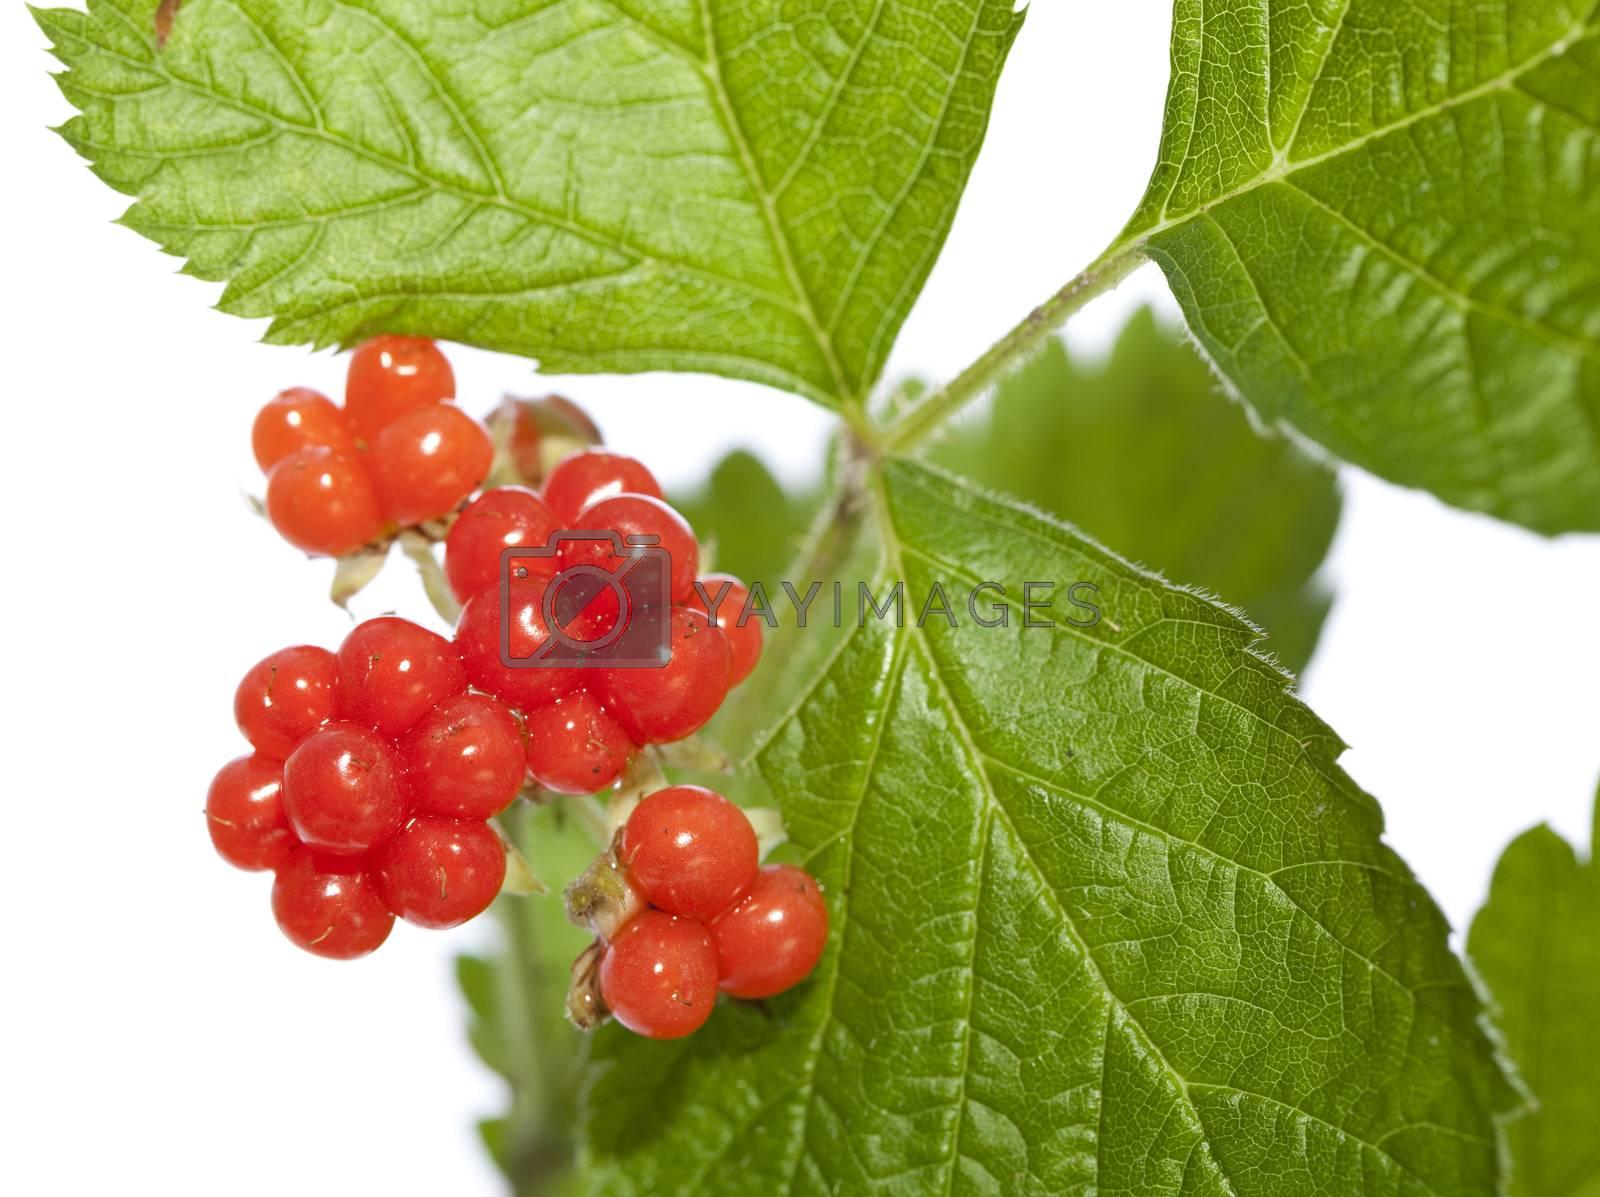 raspberries' ripe fruit on twig on white background